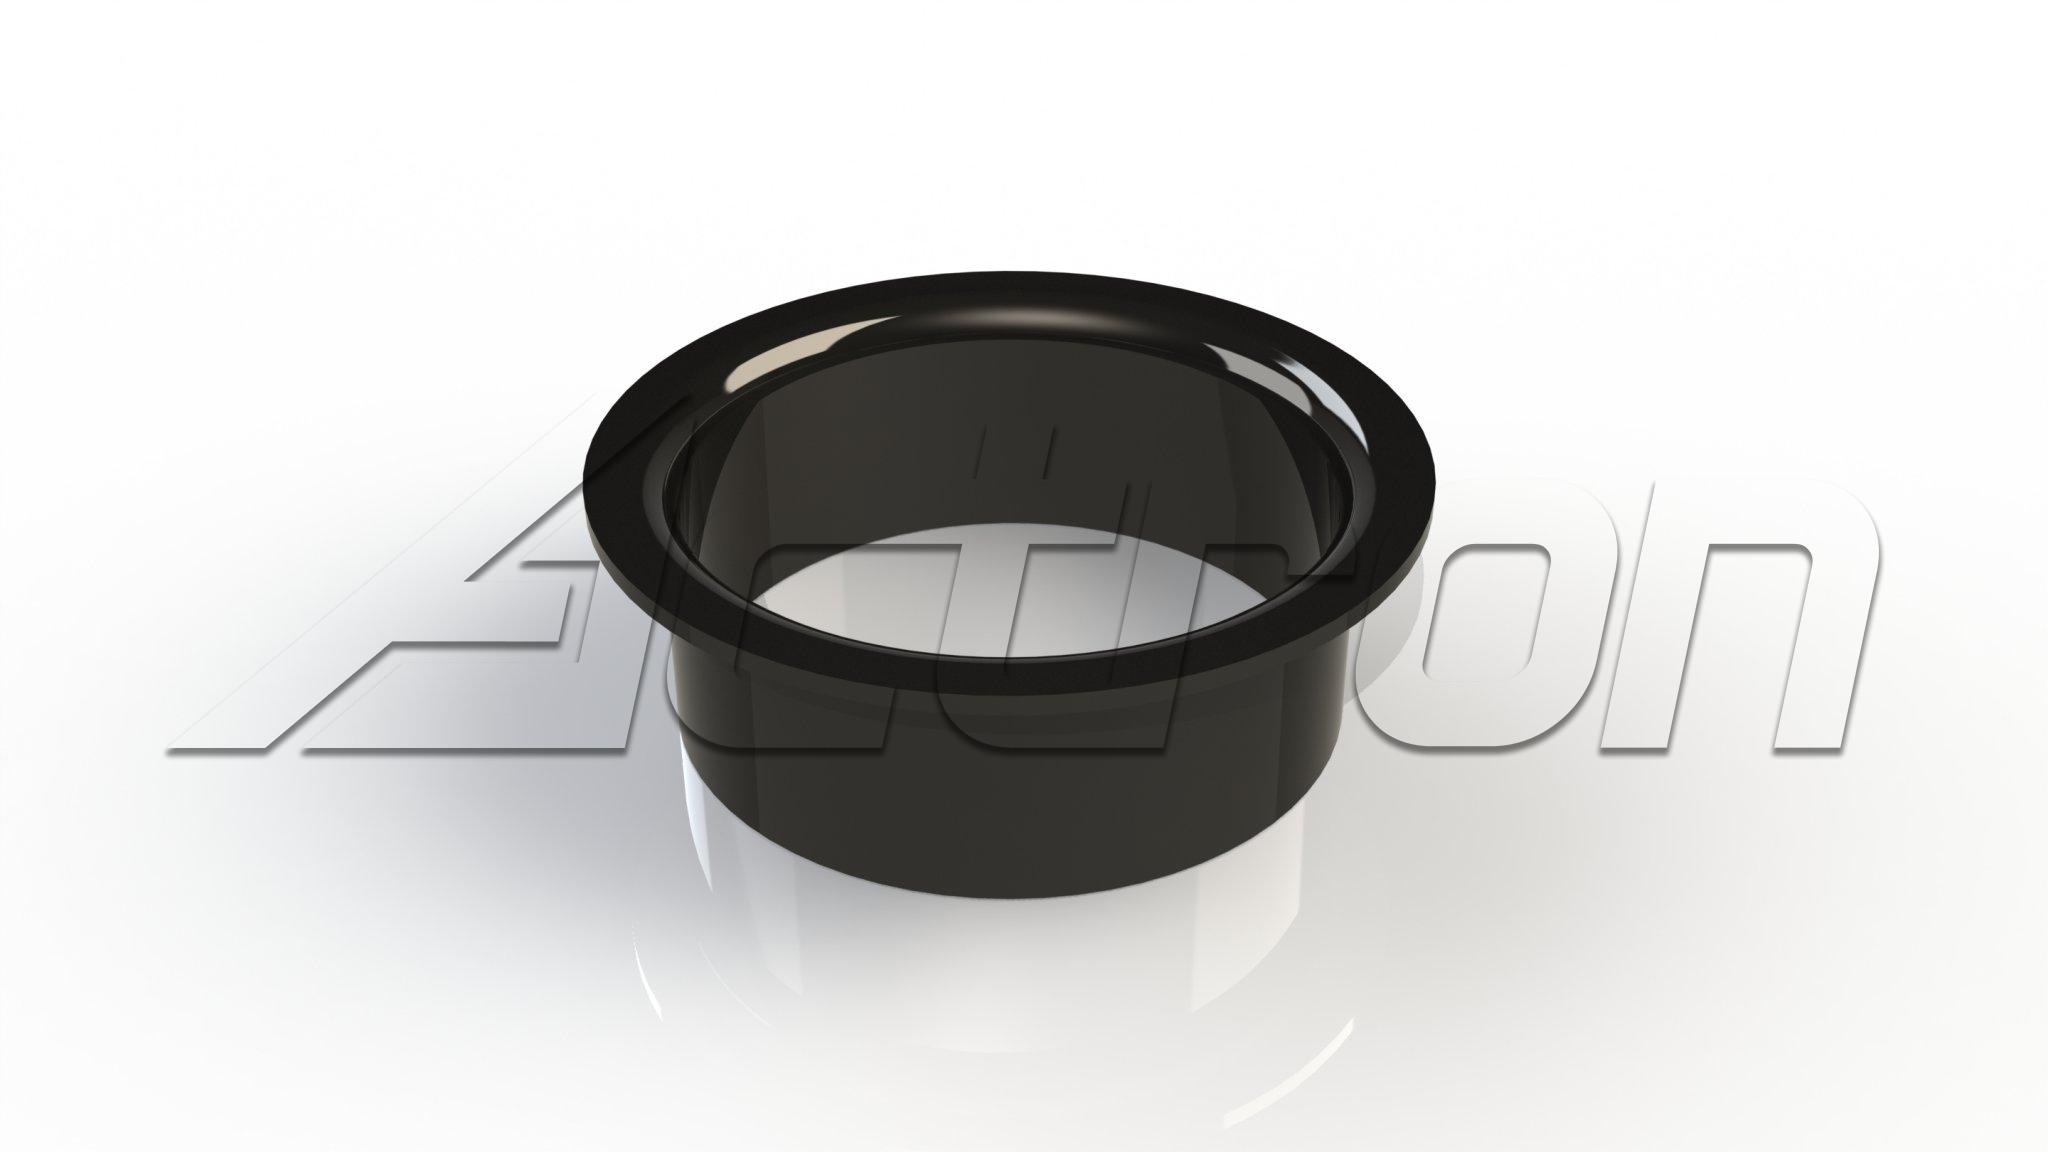 sleeve-8211-trim-5506-a43011.jpg